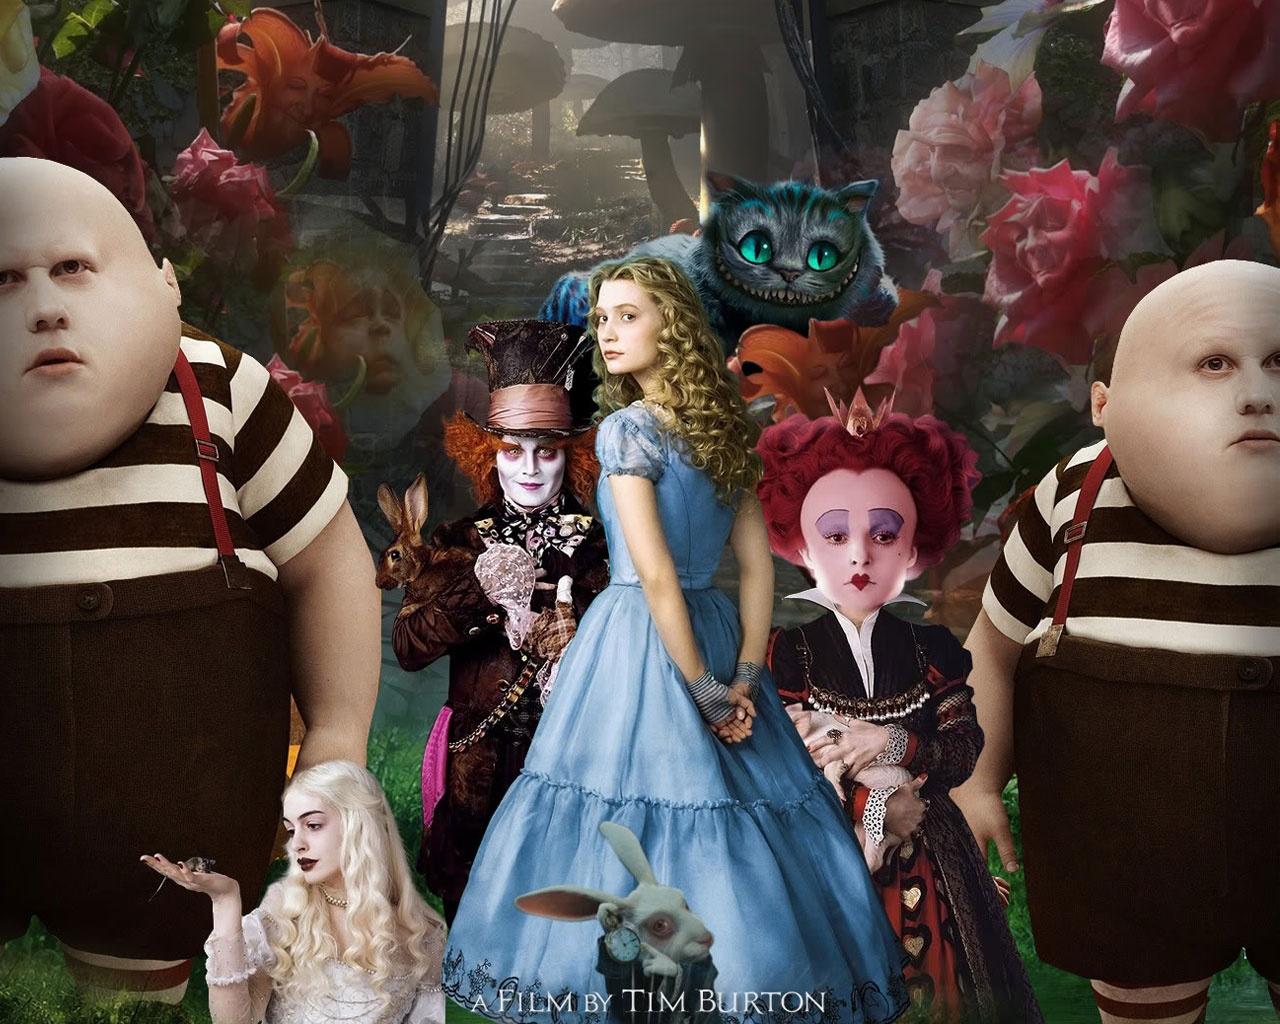 Alice in wonderland movie poster wallpapers in jpg format for free.